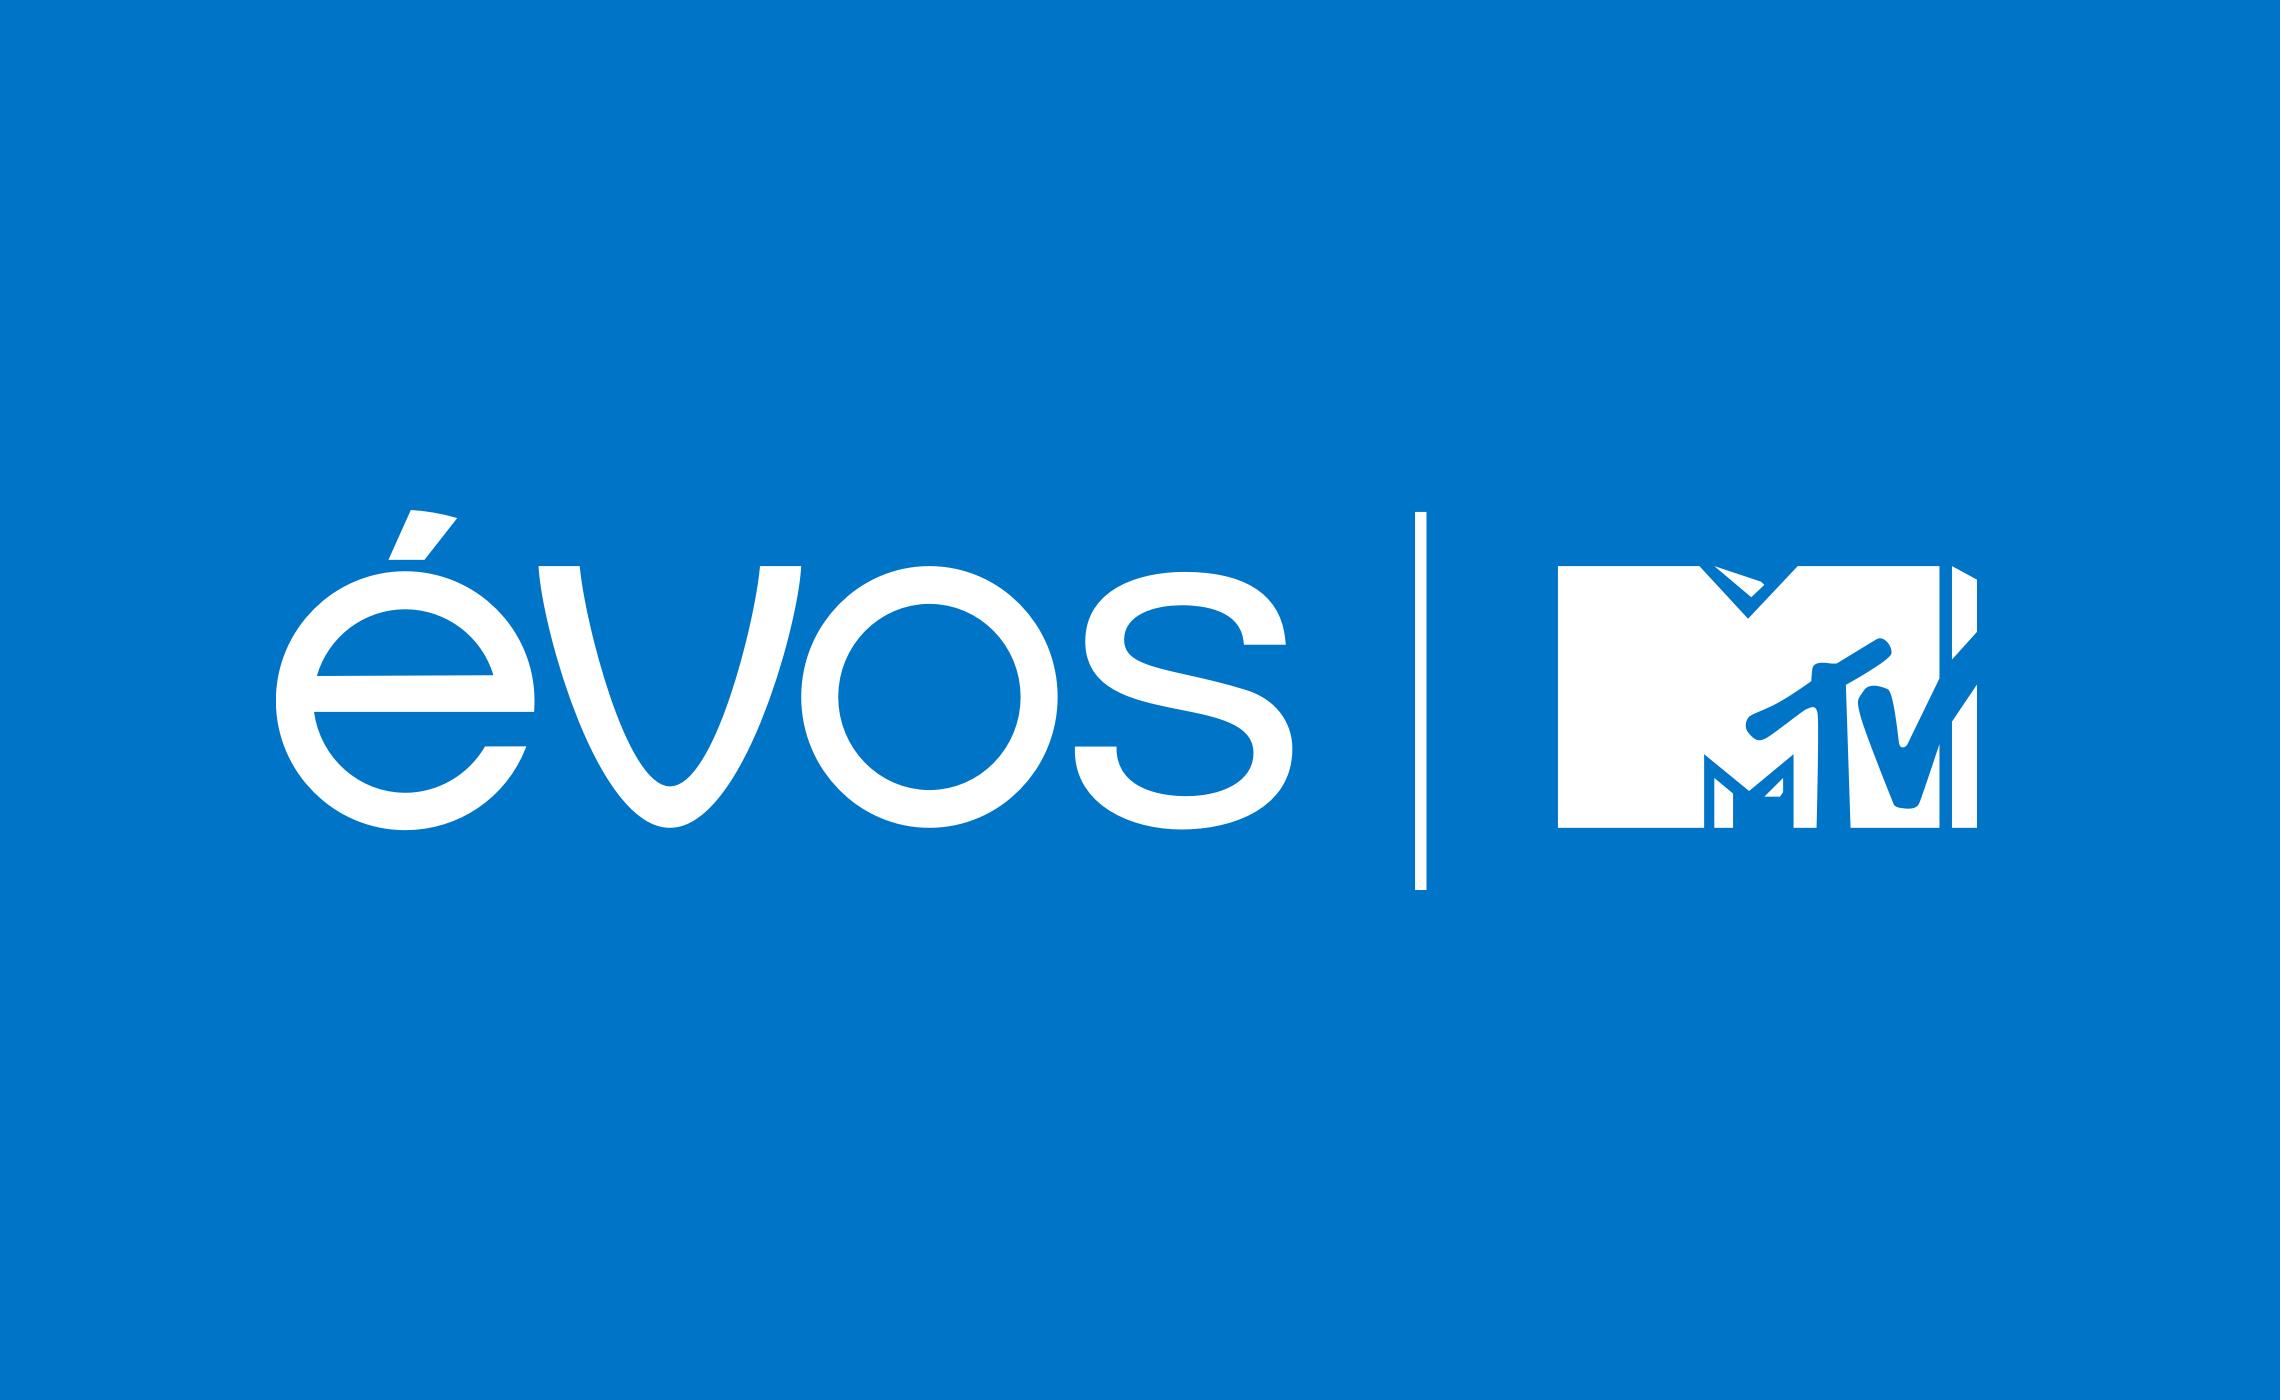 Évos | MTV – branding